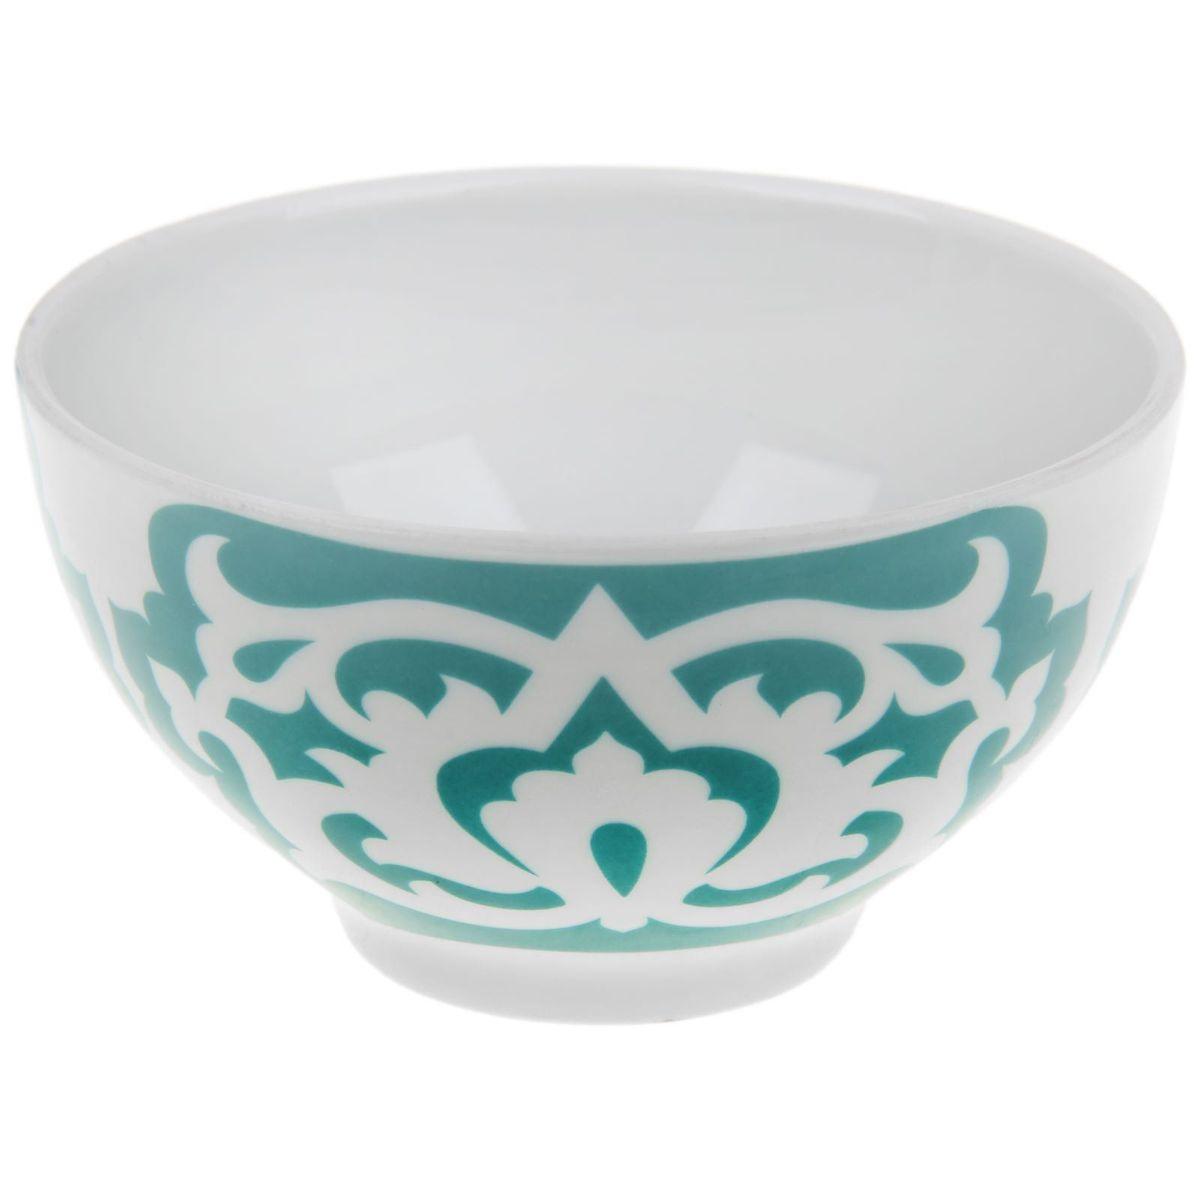 Пиала Азия, цвет: белый, зеленый, 250 мл1303821